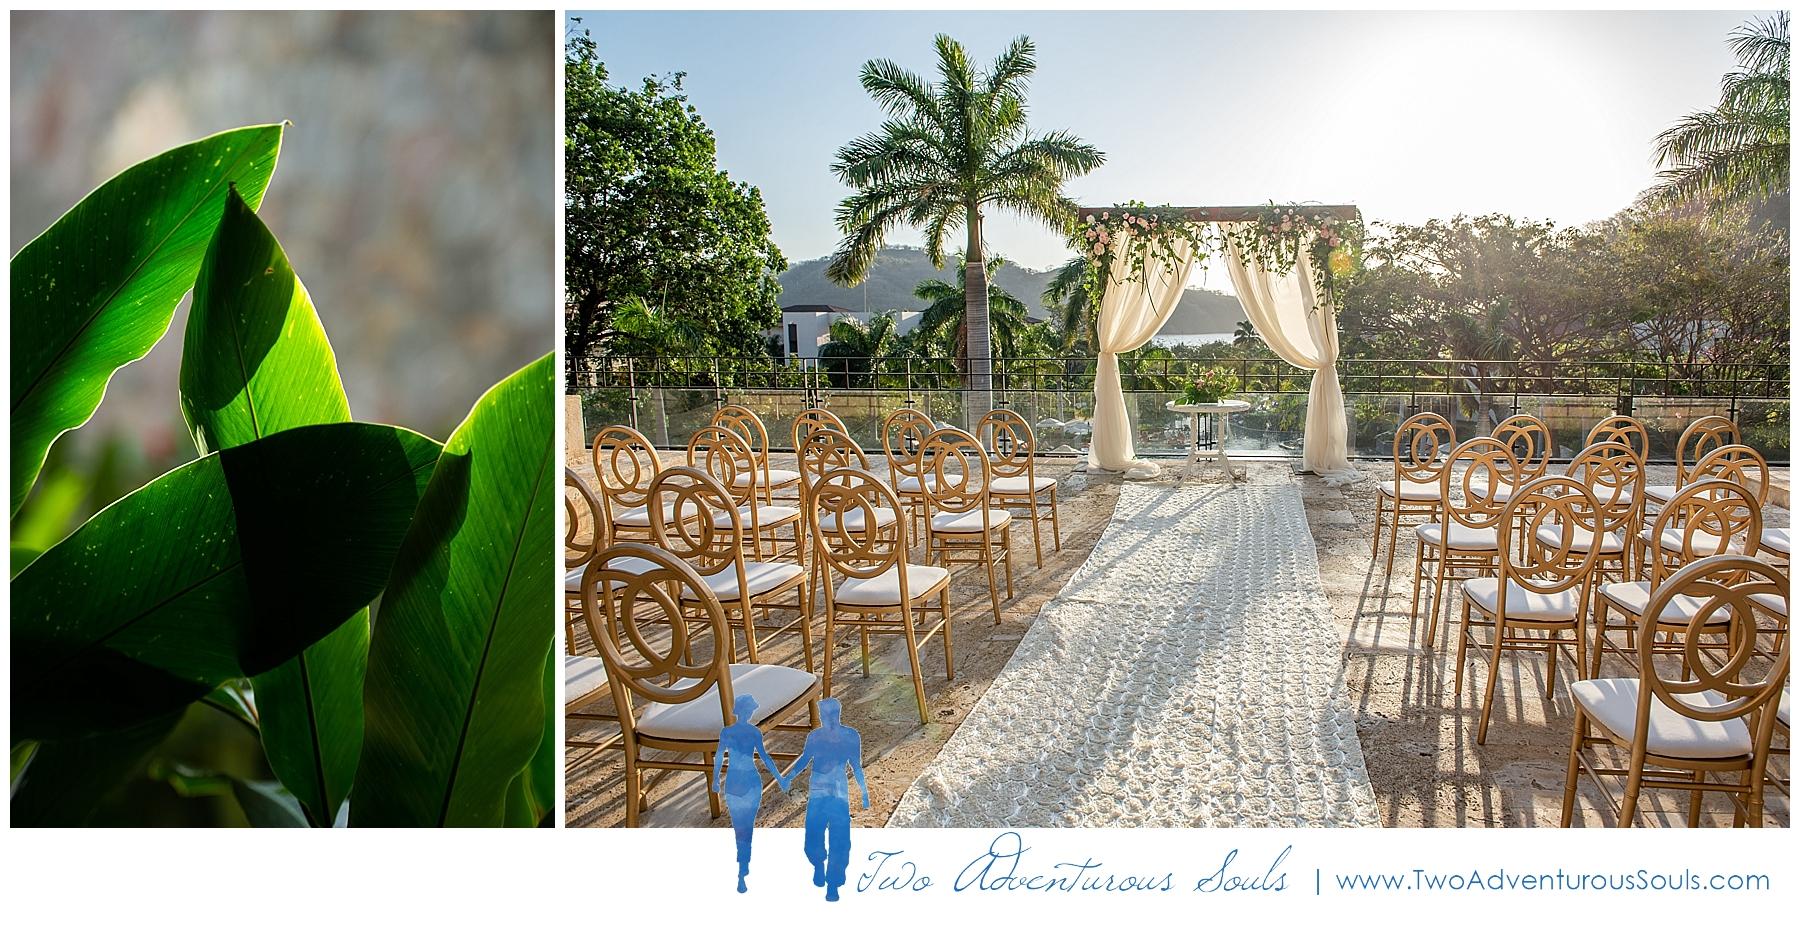 Costa Rica Wedding Photographers, Dreams las Mareas Wedding, Destination Wedding Photographers, Two Adventurous Souls - 022219_0014.jpg